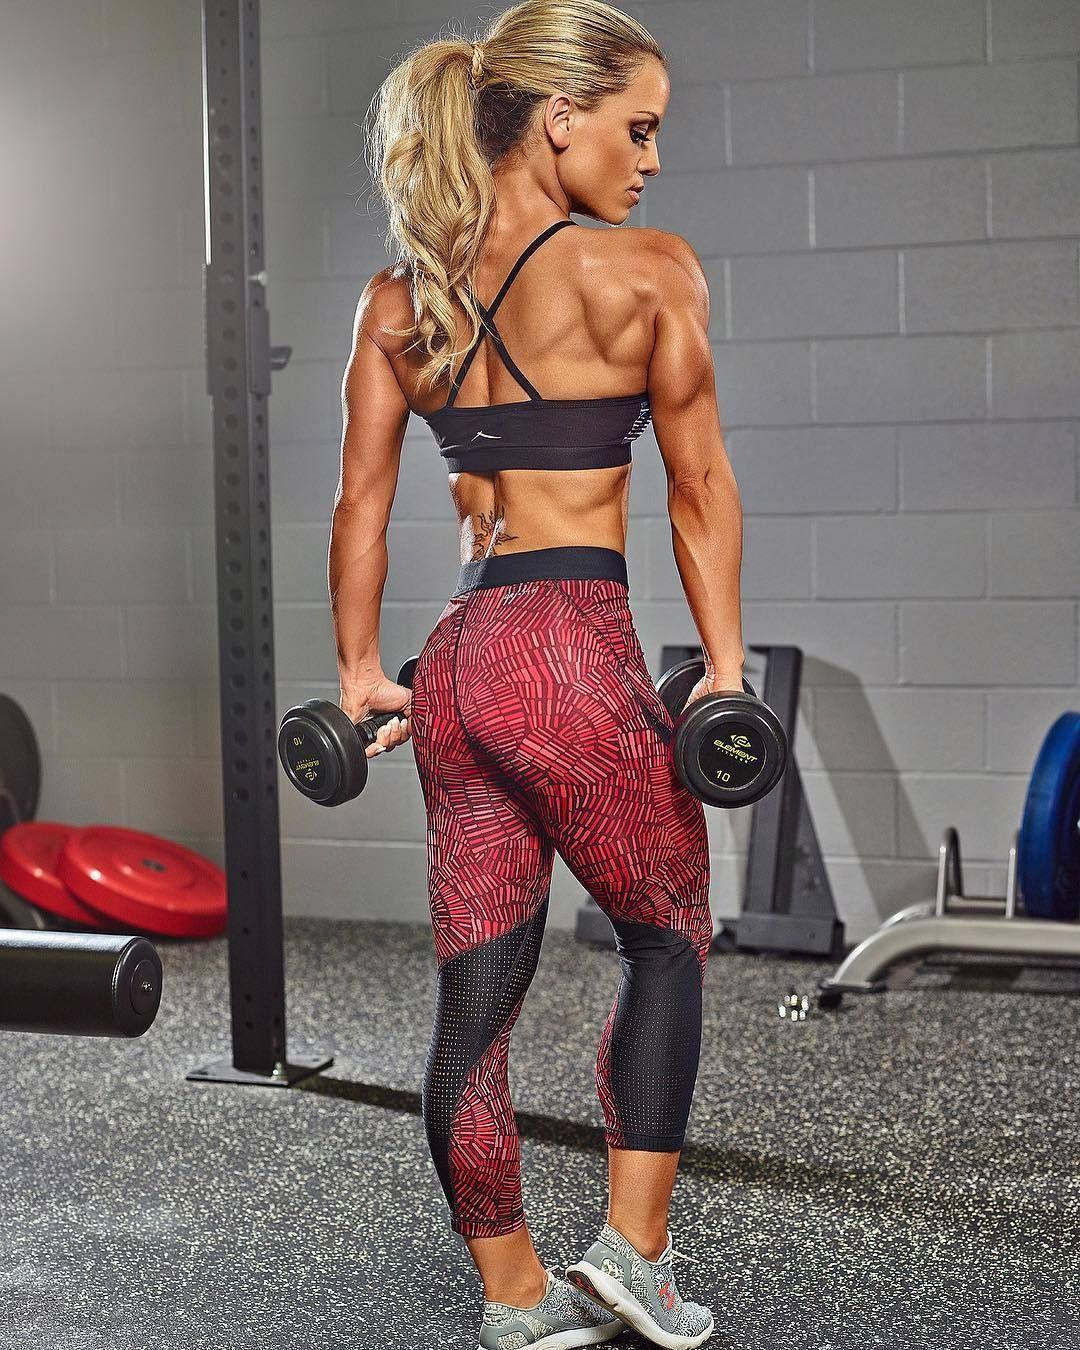 The Art Of Fitness Traening